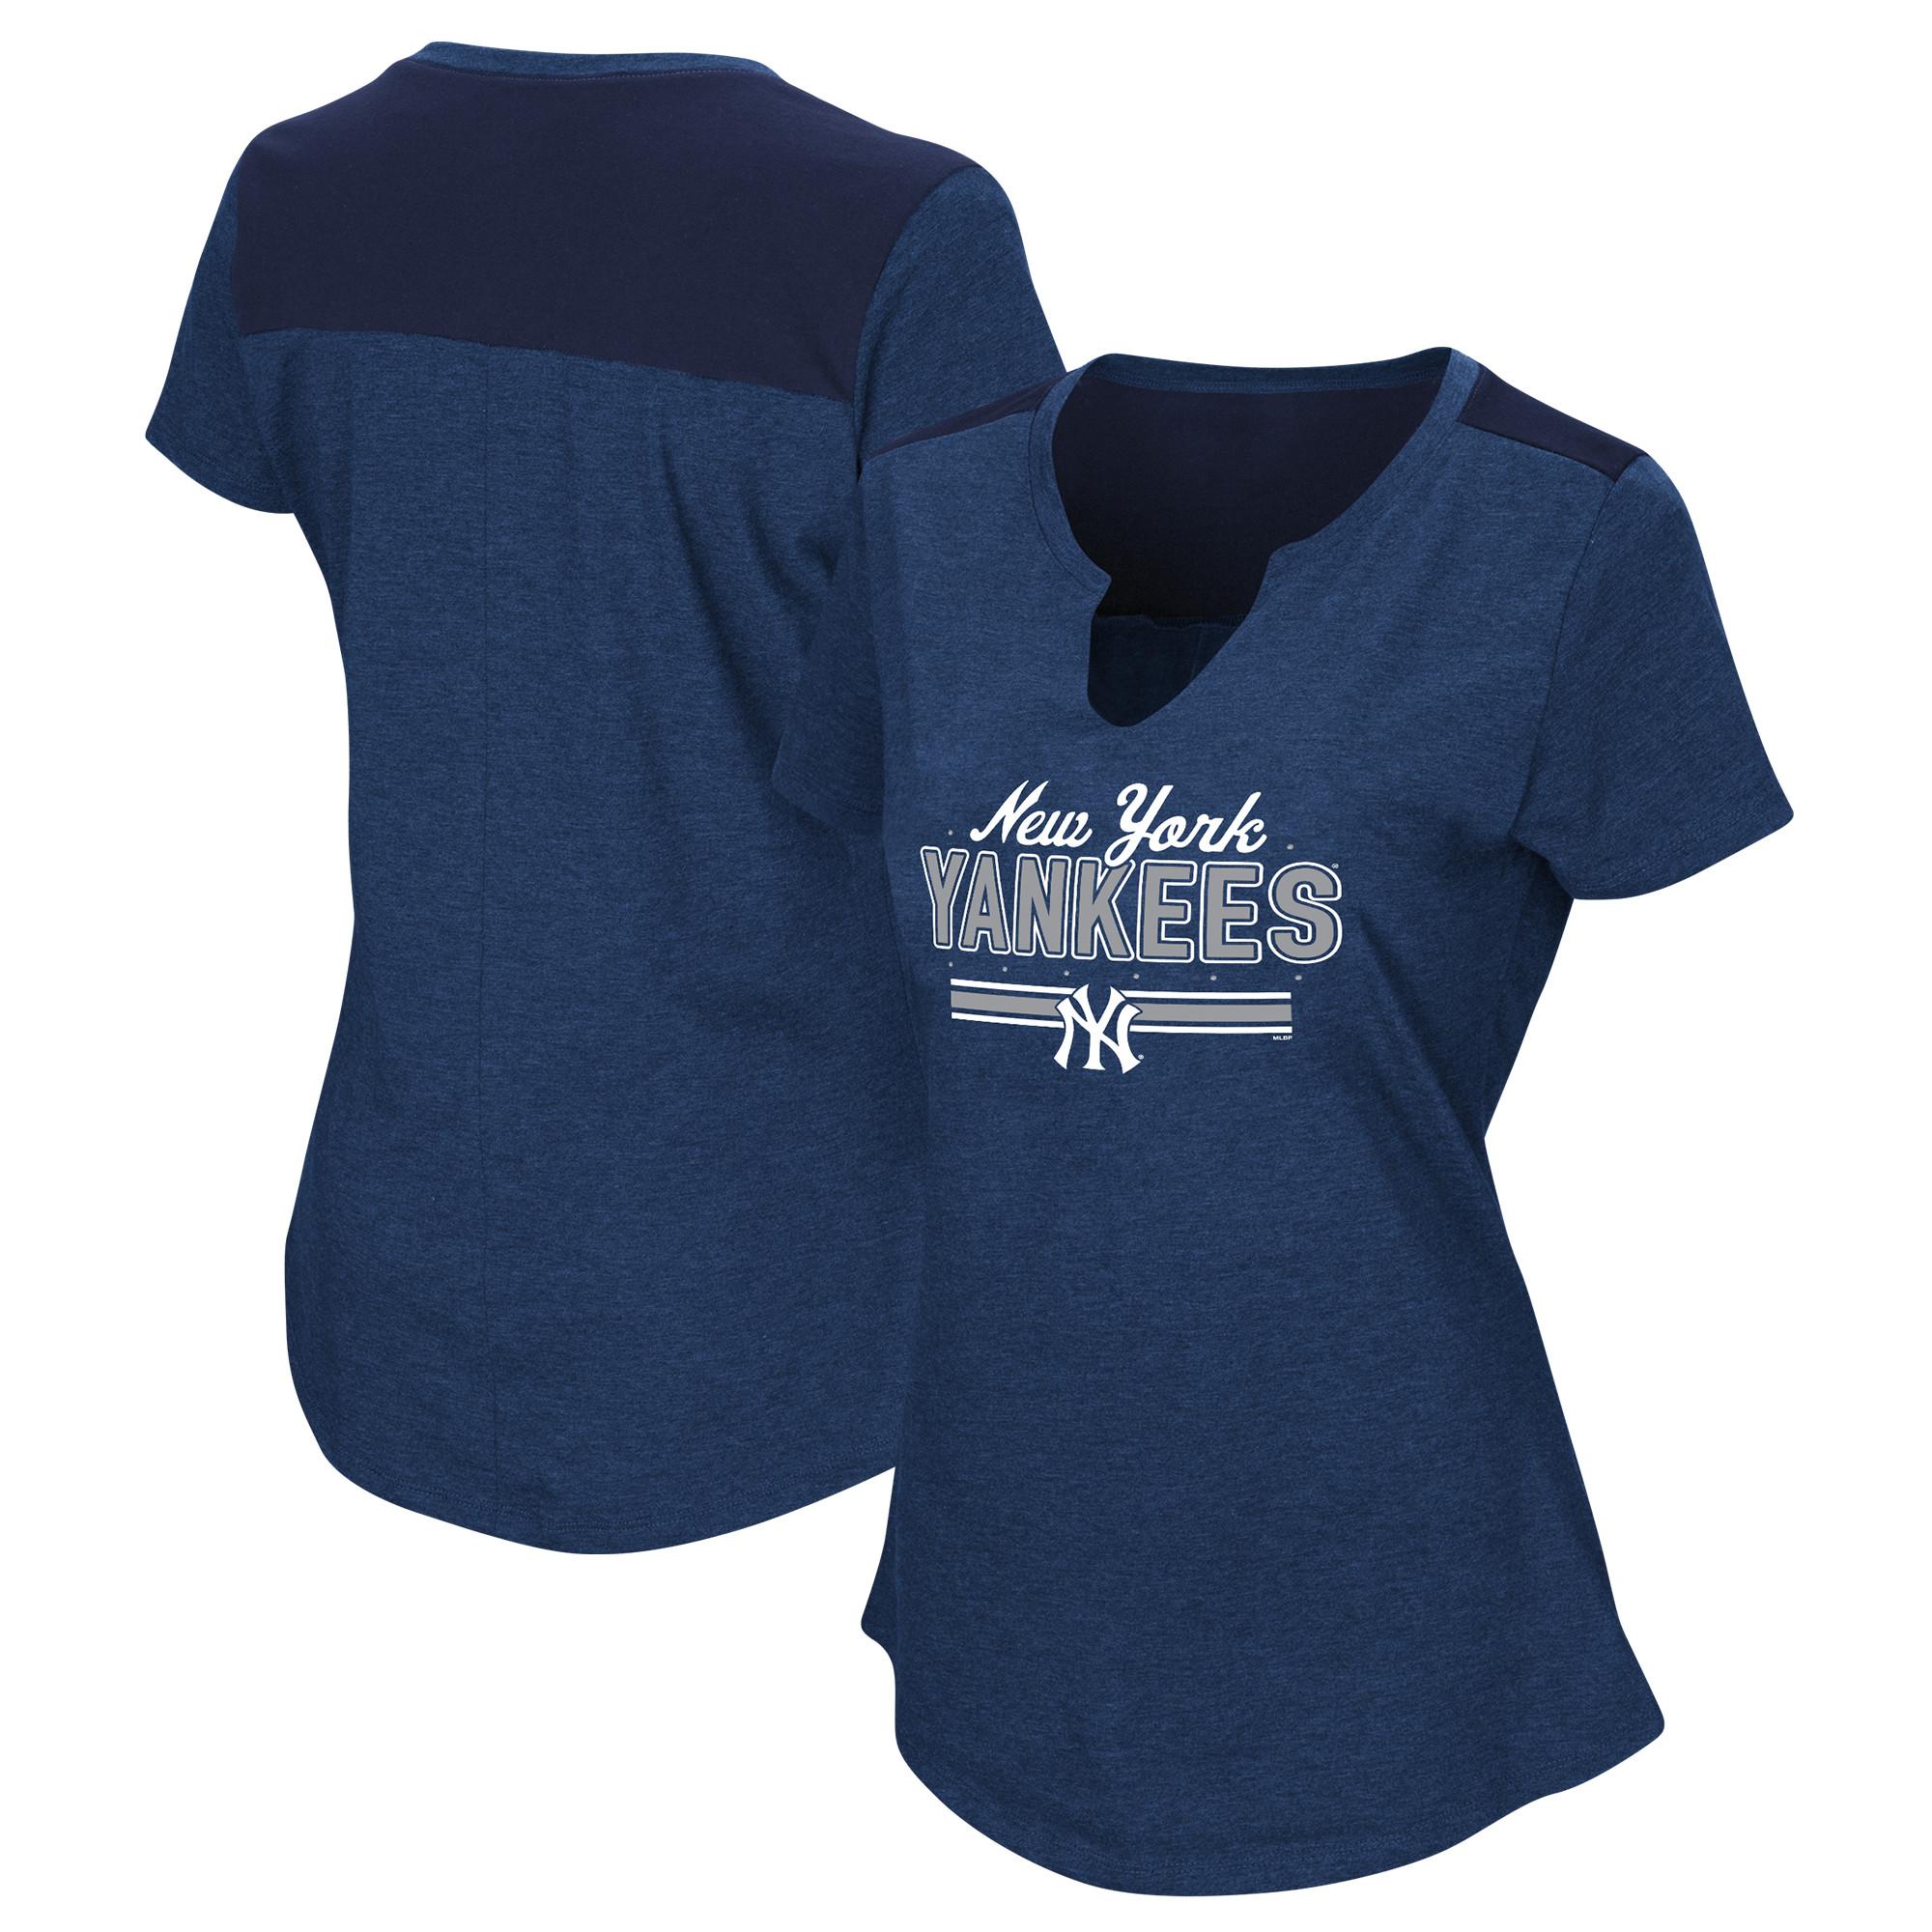 Women's Majestic Navy New York Yankees Plus Size Switch Hitter T-Shirt